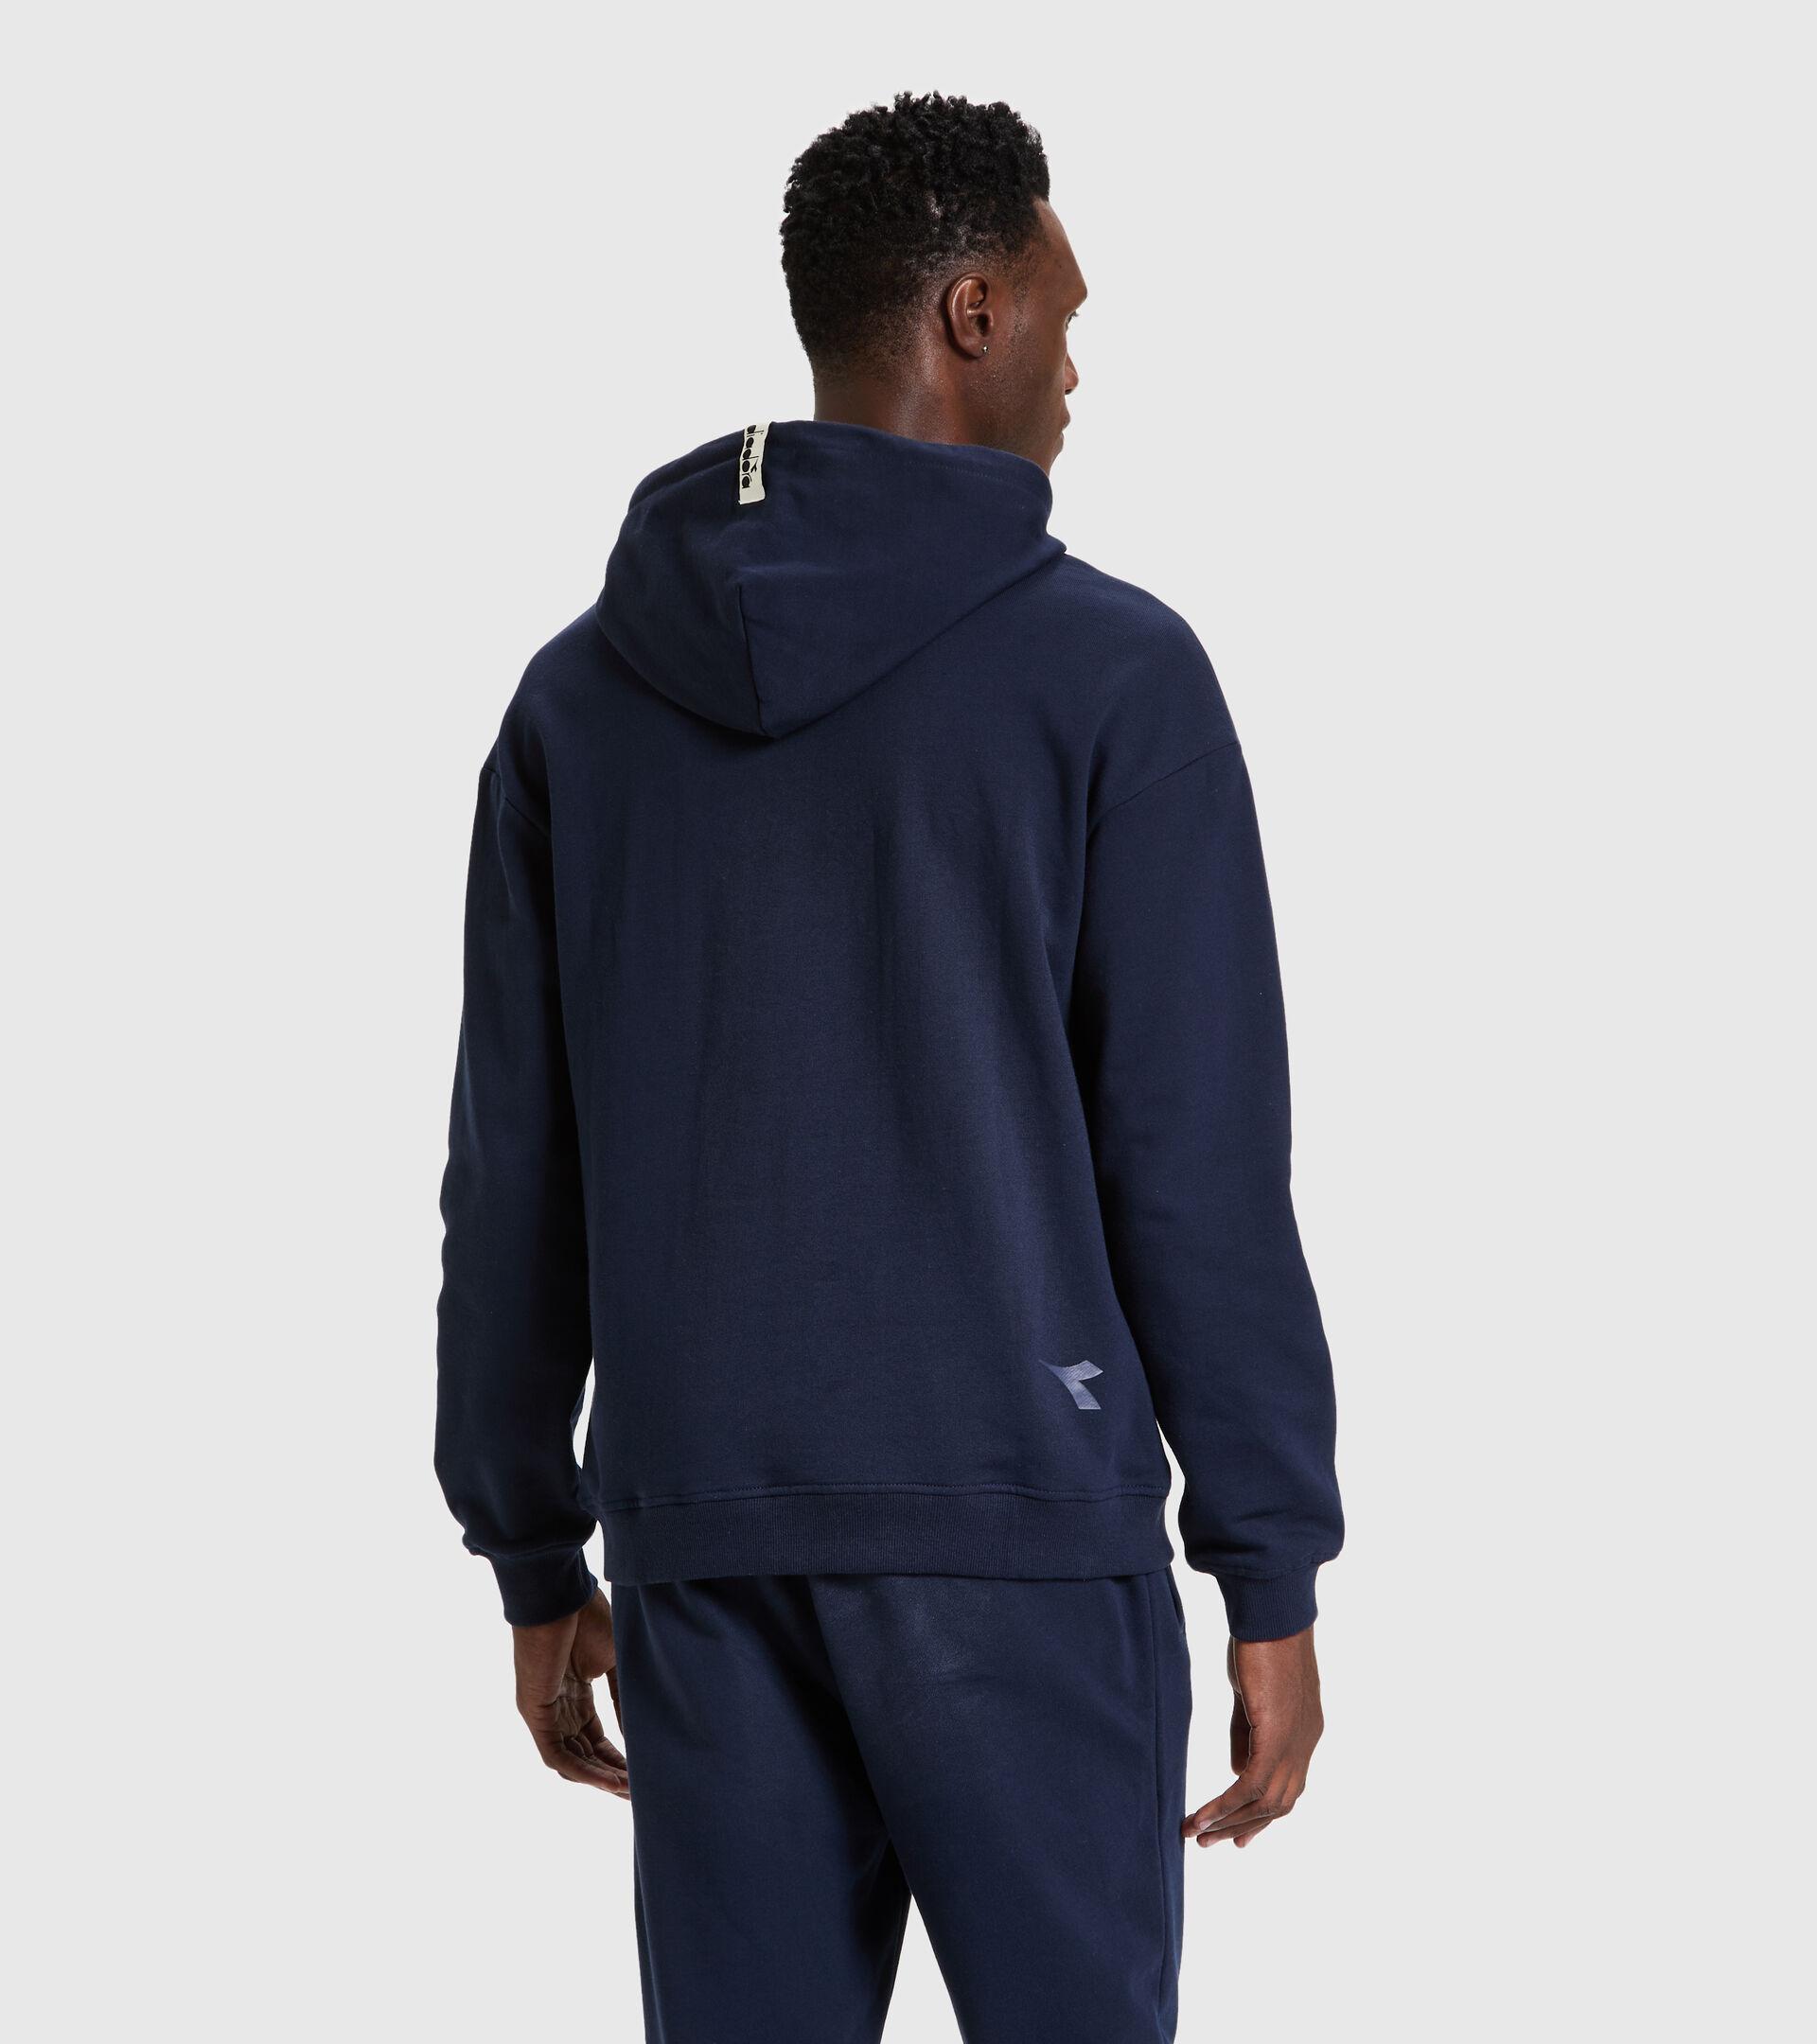 Hooded sweatshirt - Unisex HOODIE DIADORA HD CLASSIC NAVY - Diadora